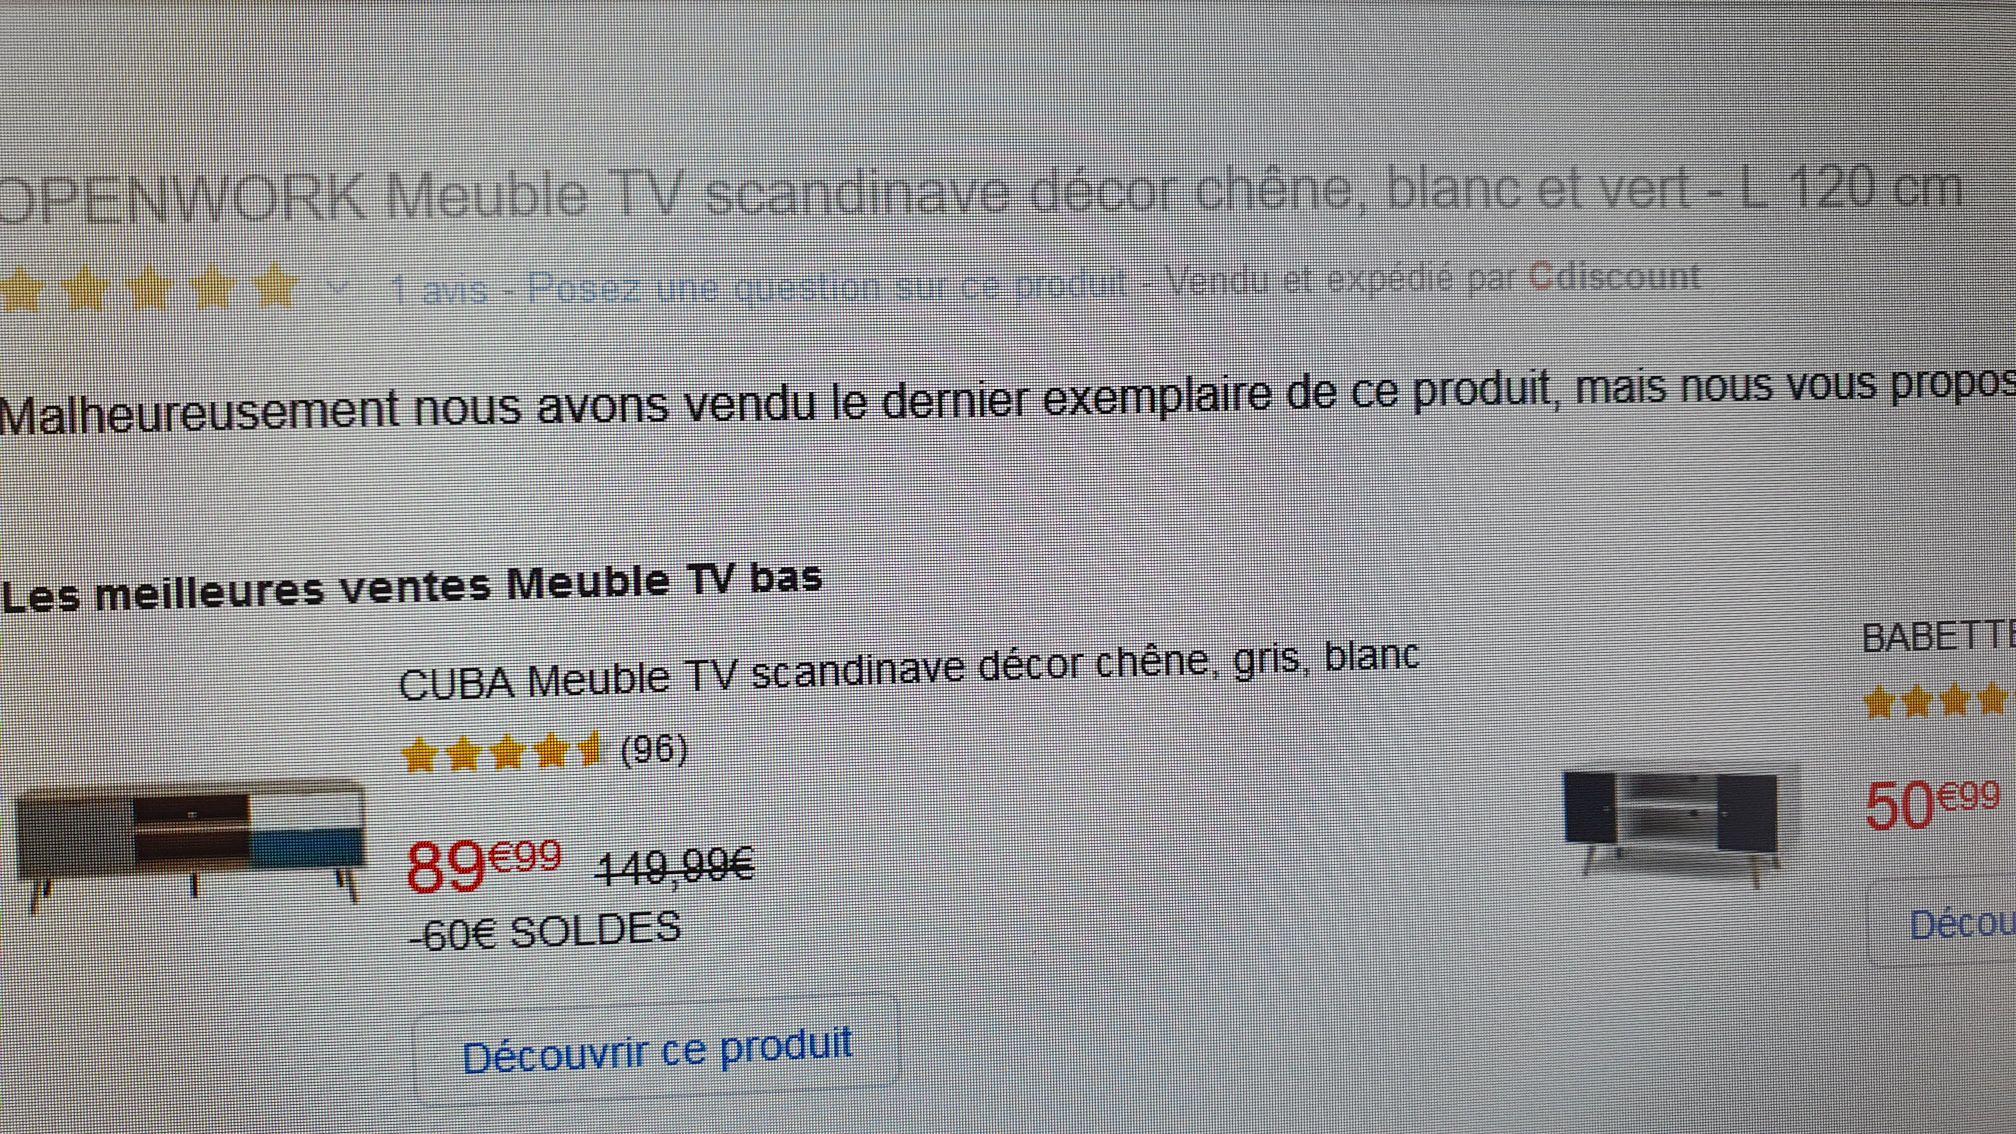 Meuble Tv Openwork 120 Cm Couleur Chene Blanc Et Vert Dealabs Com